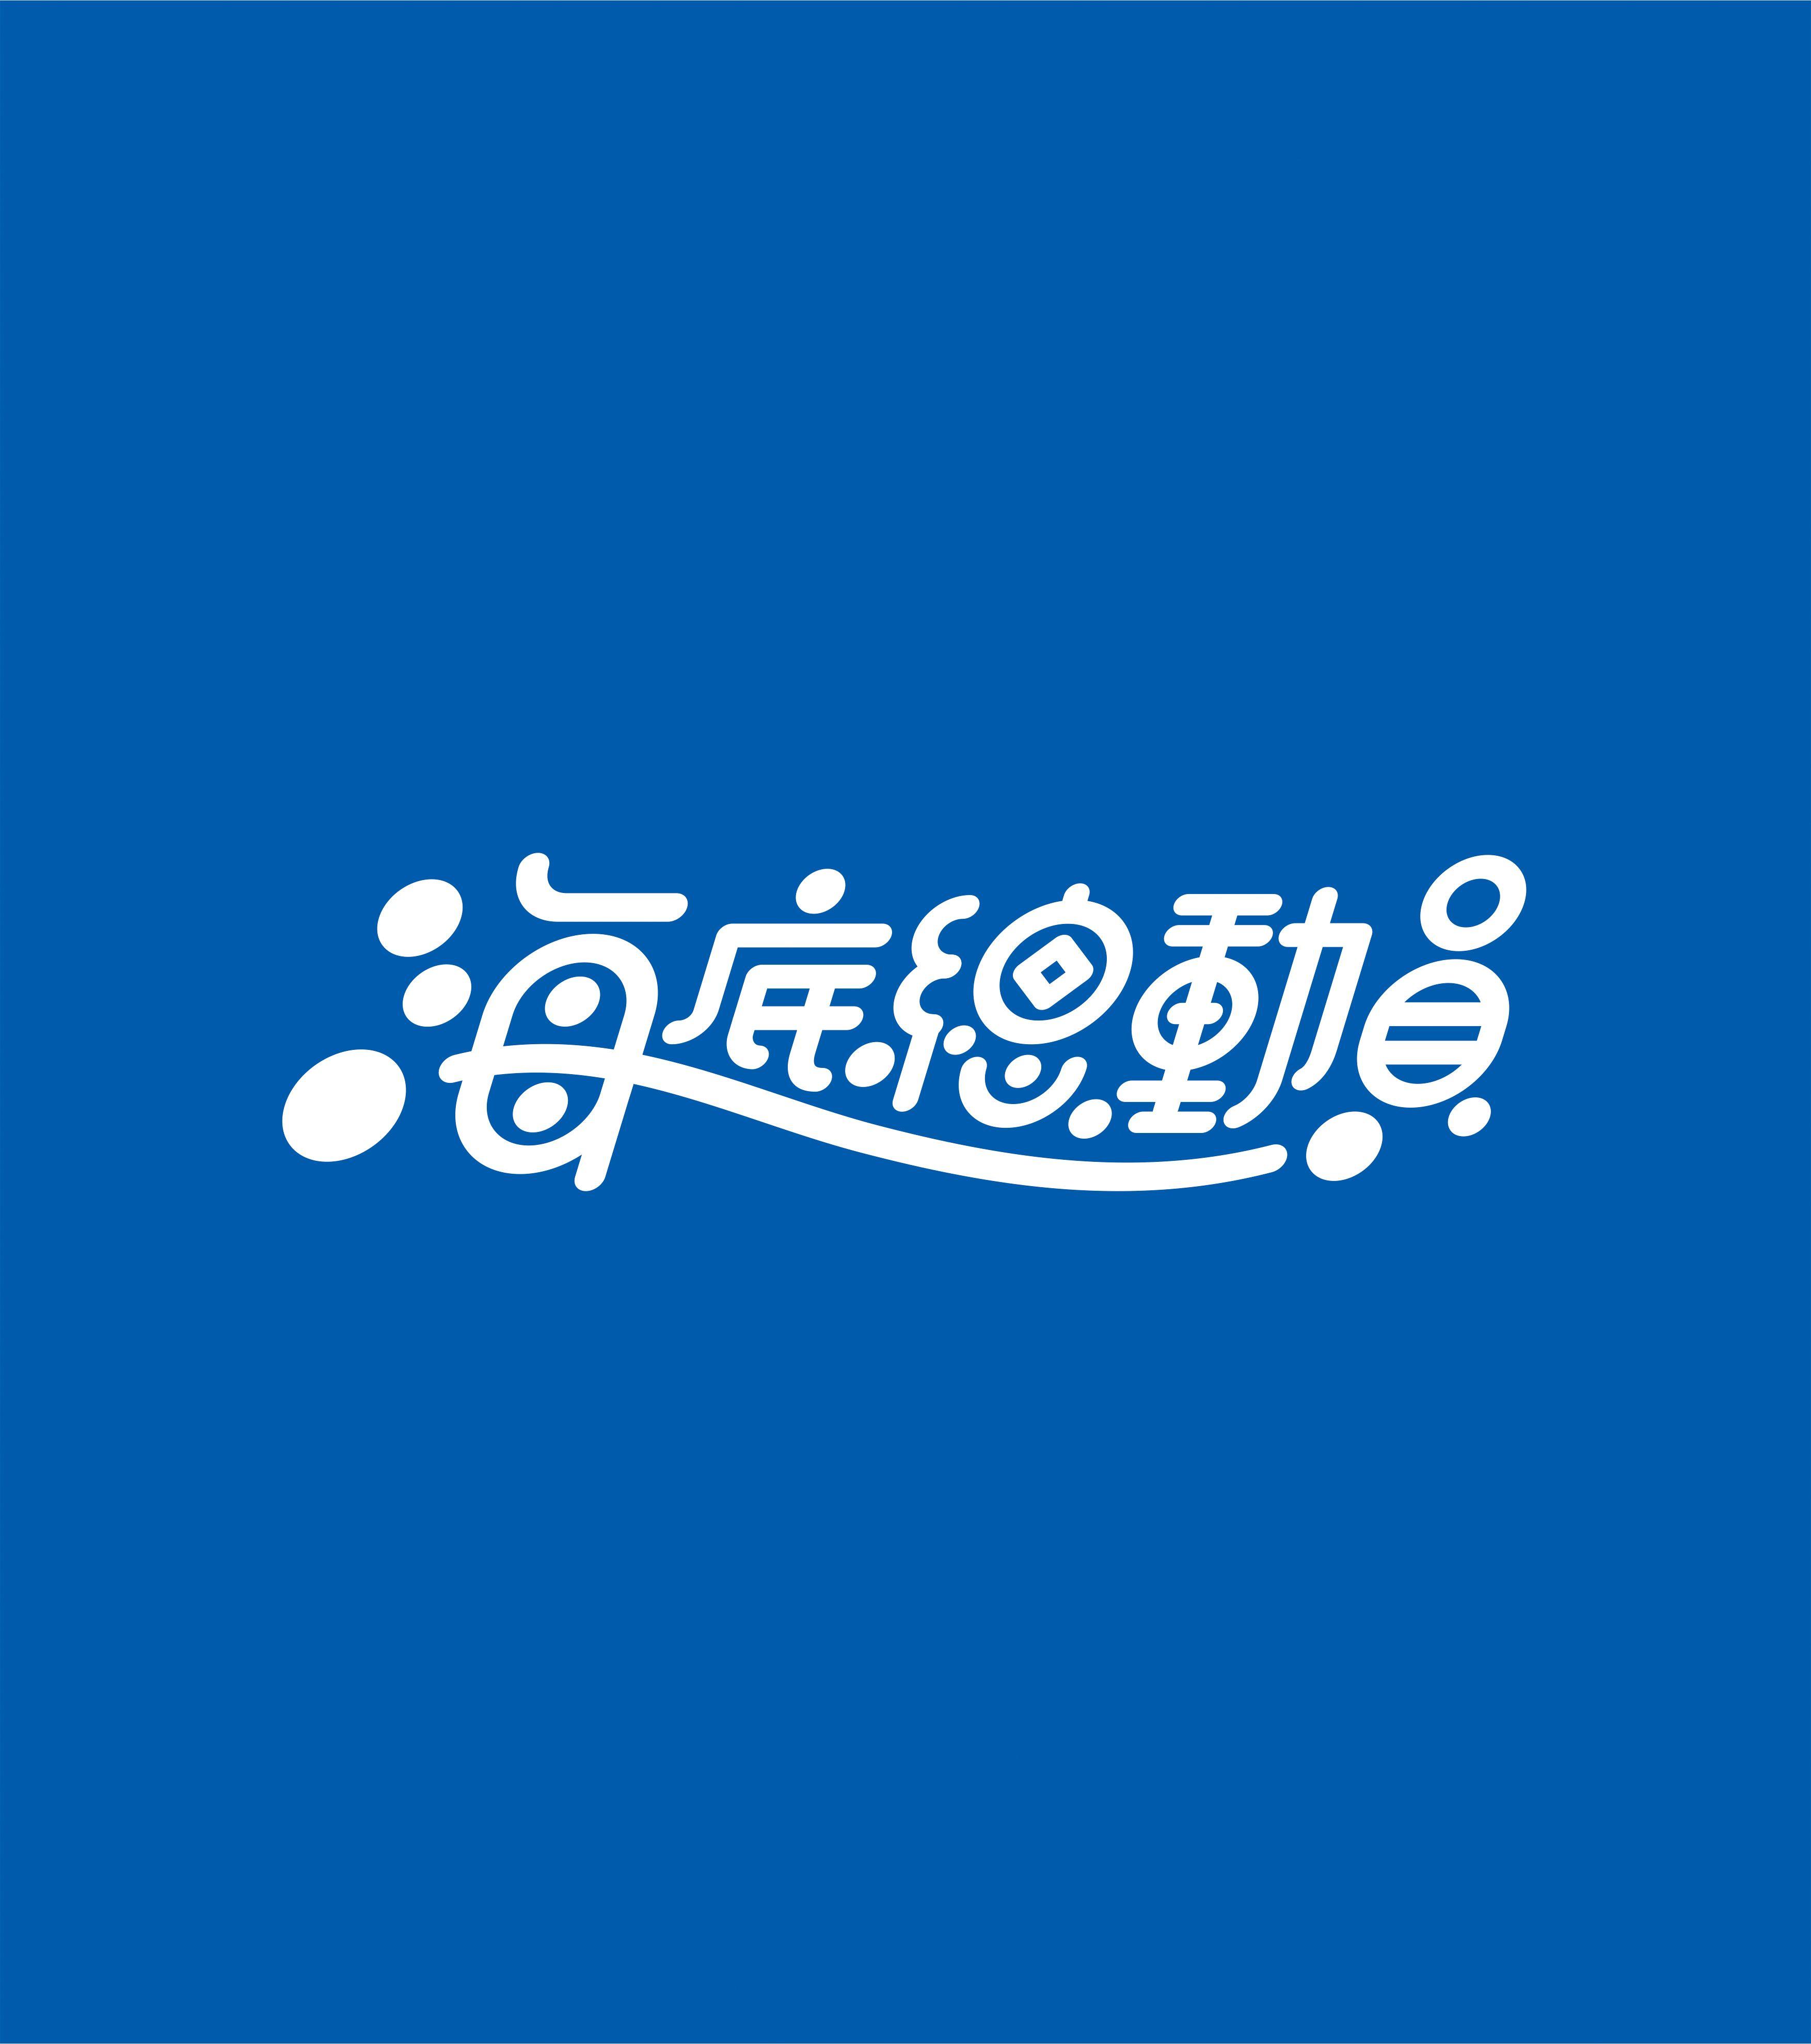 海底總動員_字體設計_Type #chinesetypography